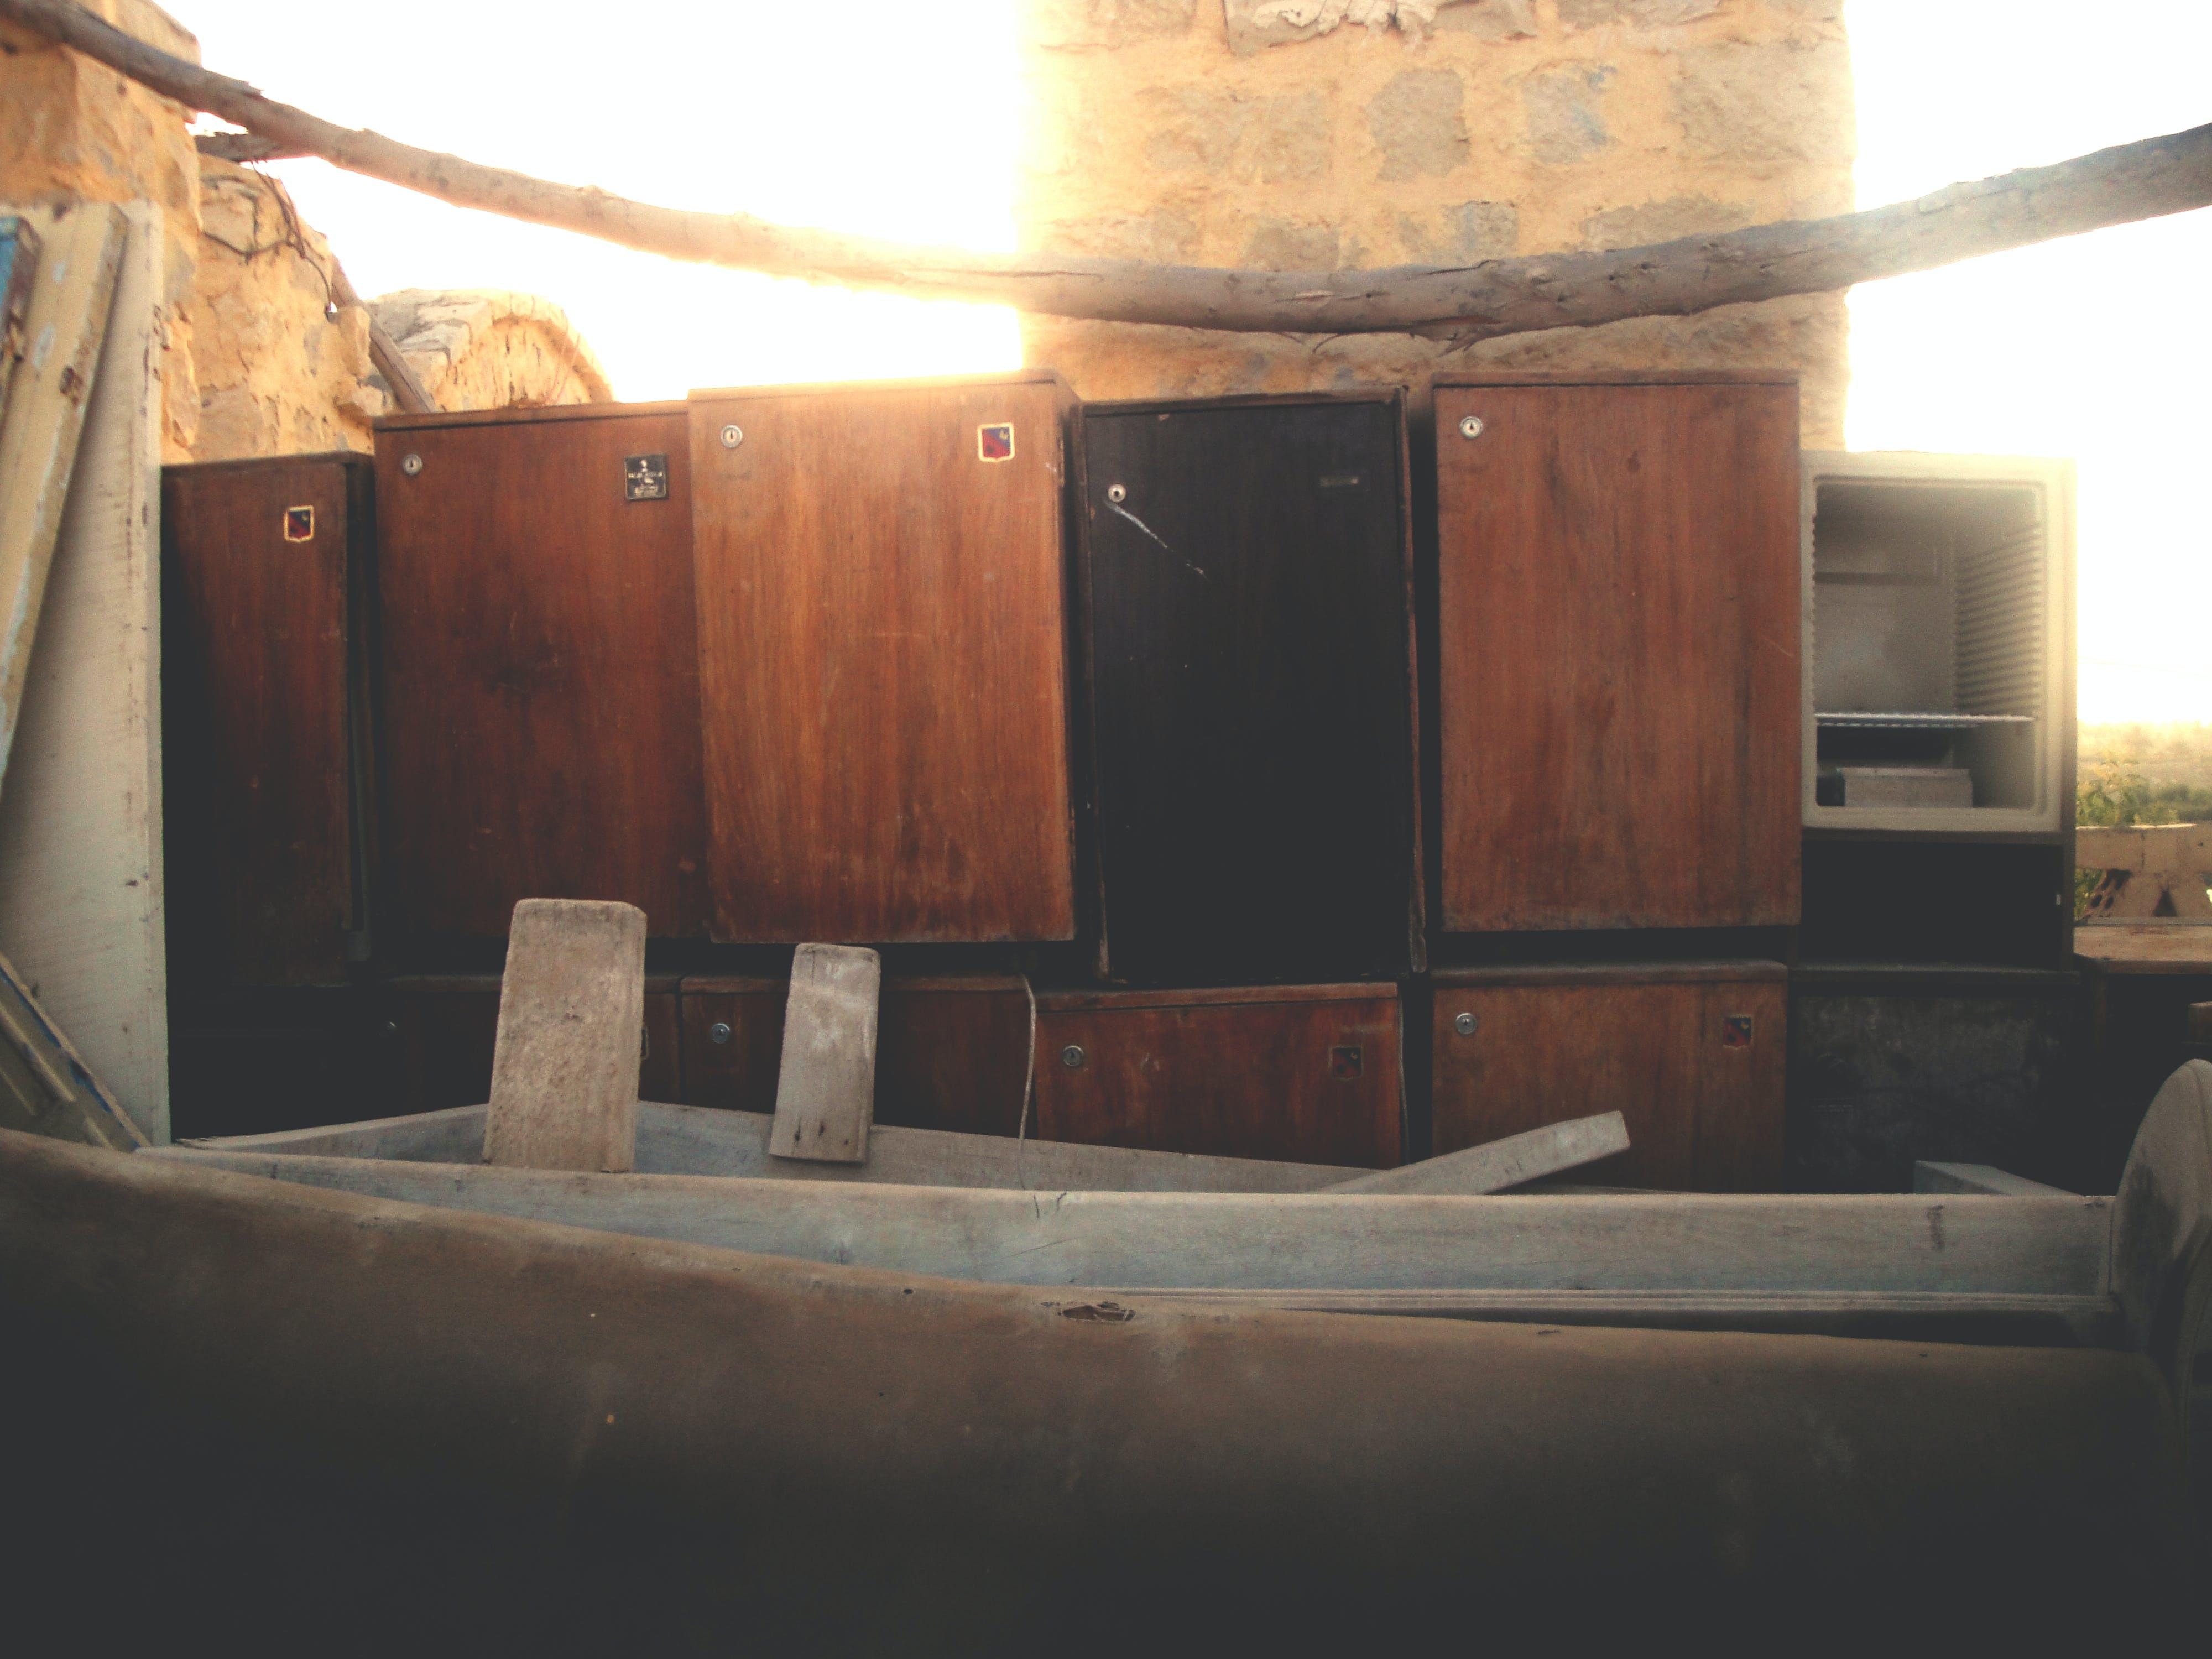 Free stock photo of abandoned, arabesque, broken, furniture